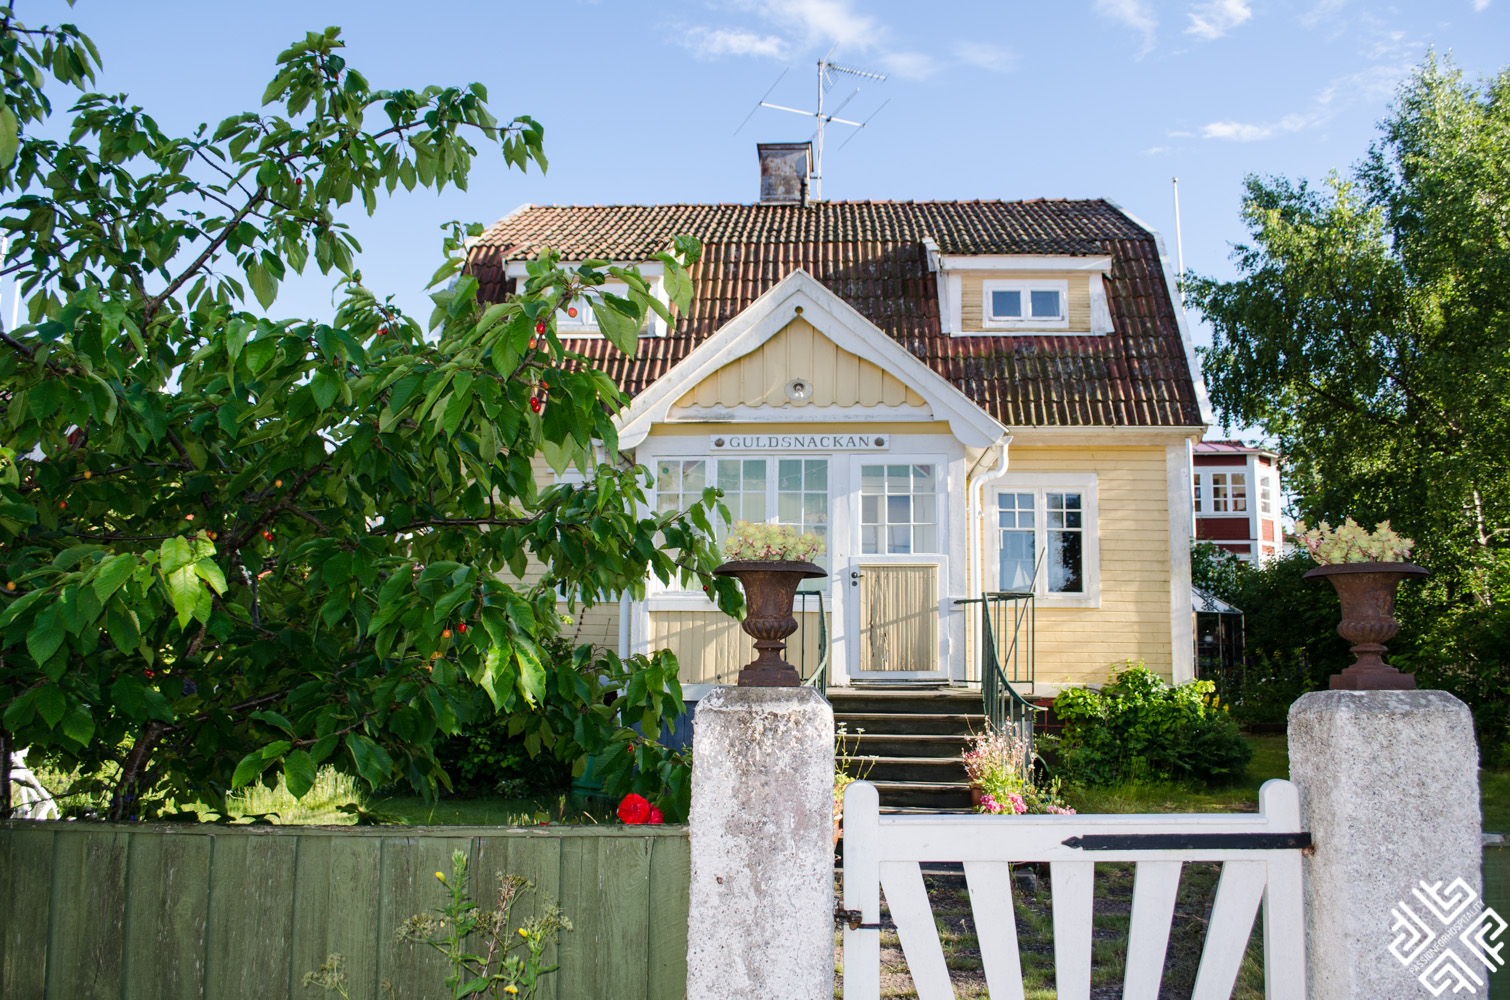 stockholm_archipelago_sandhamn-17